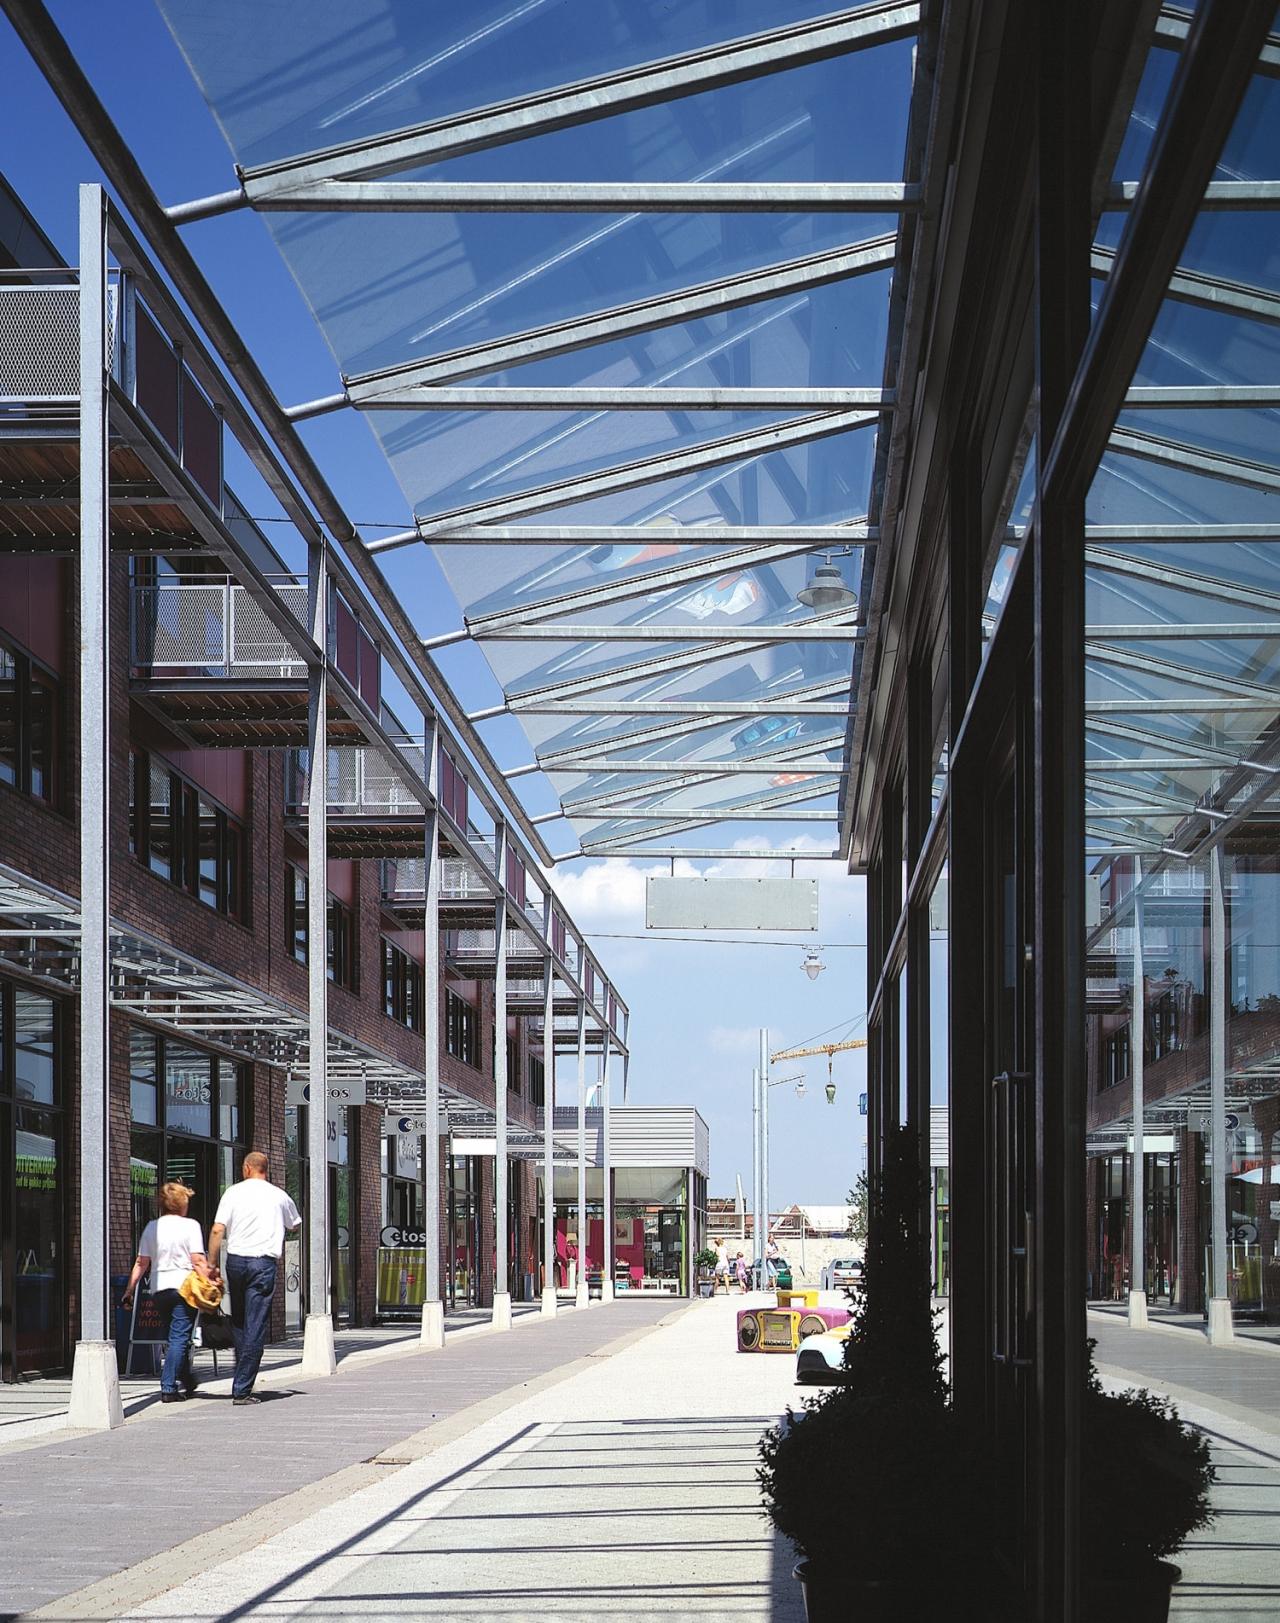 Studio leon thier winkelcentrum getsewoud - Luifel glas ...